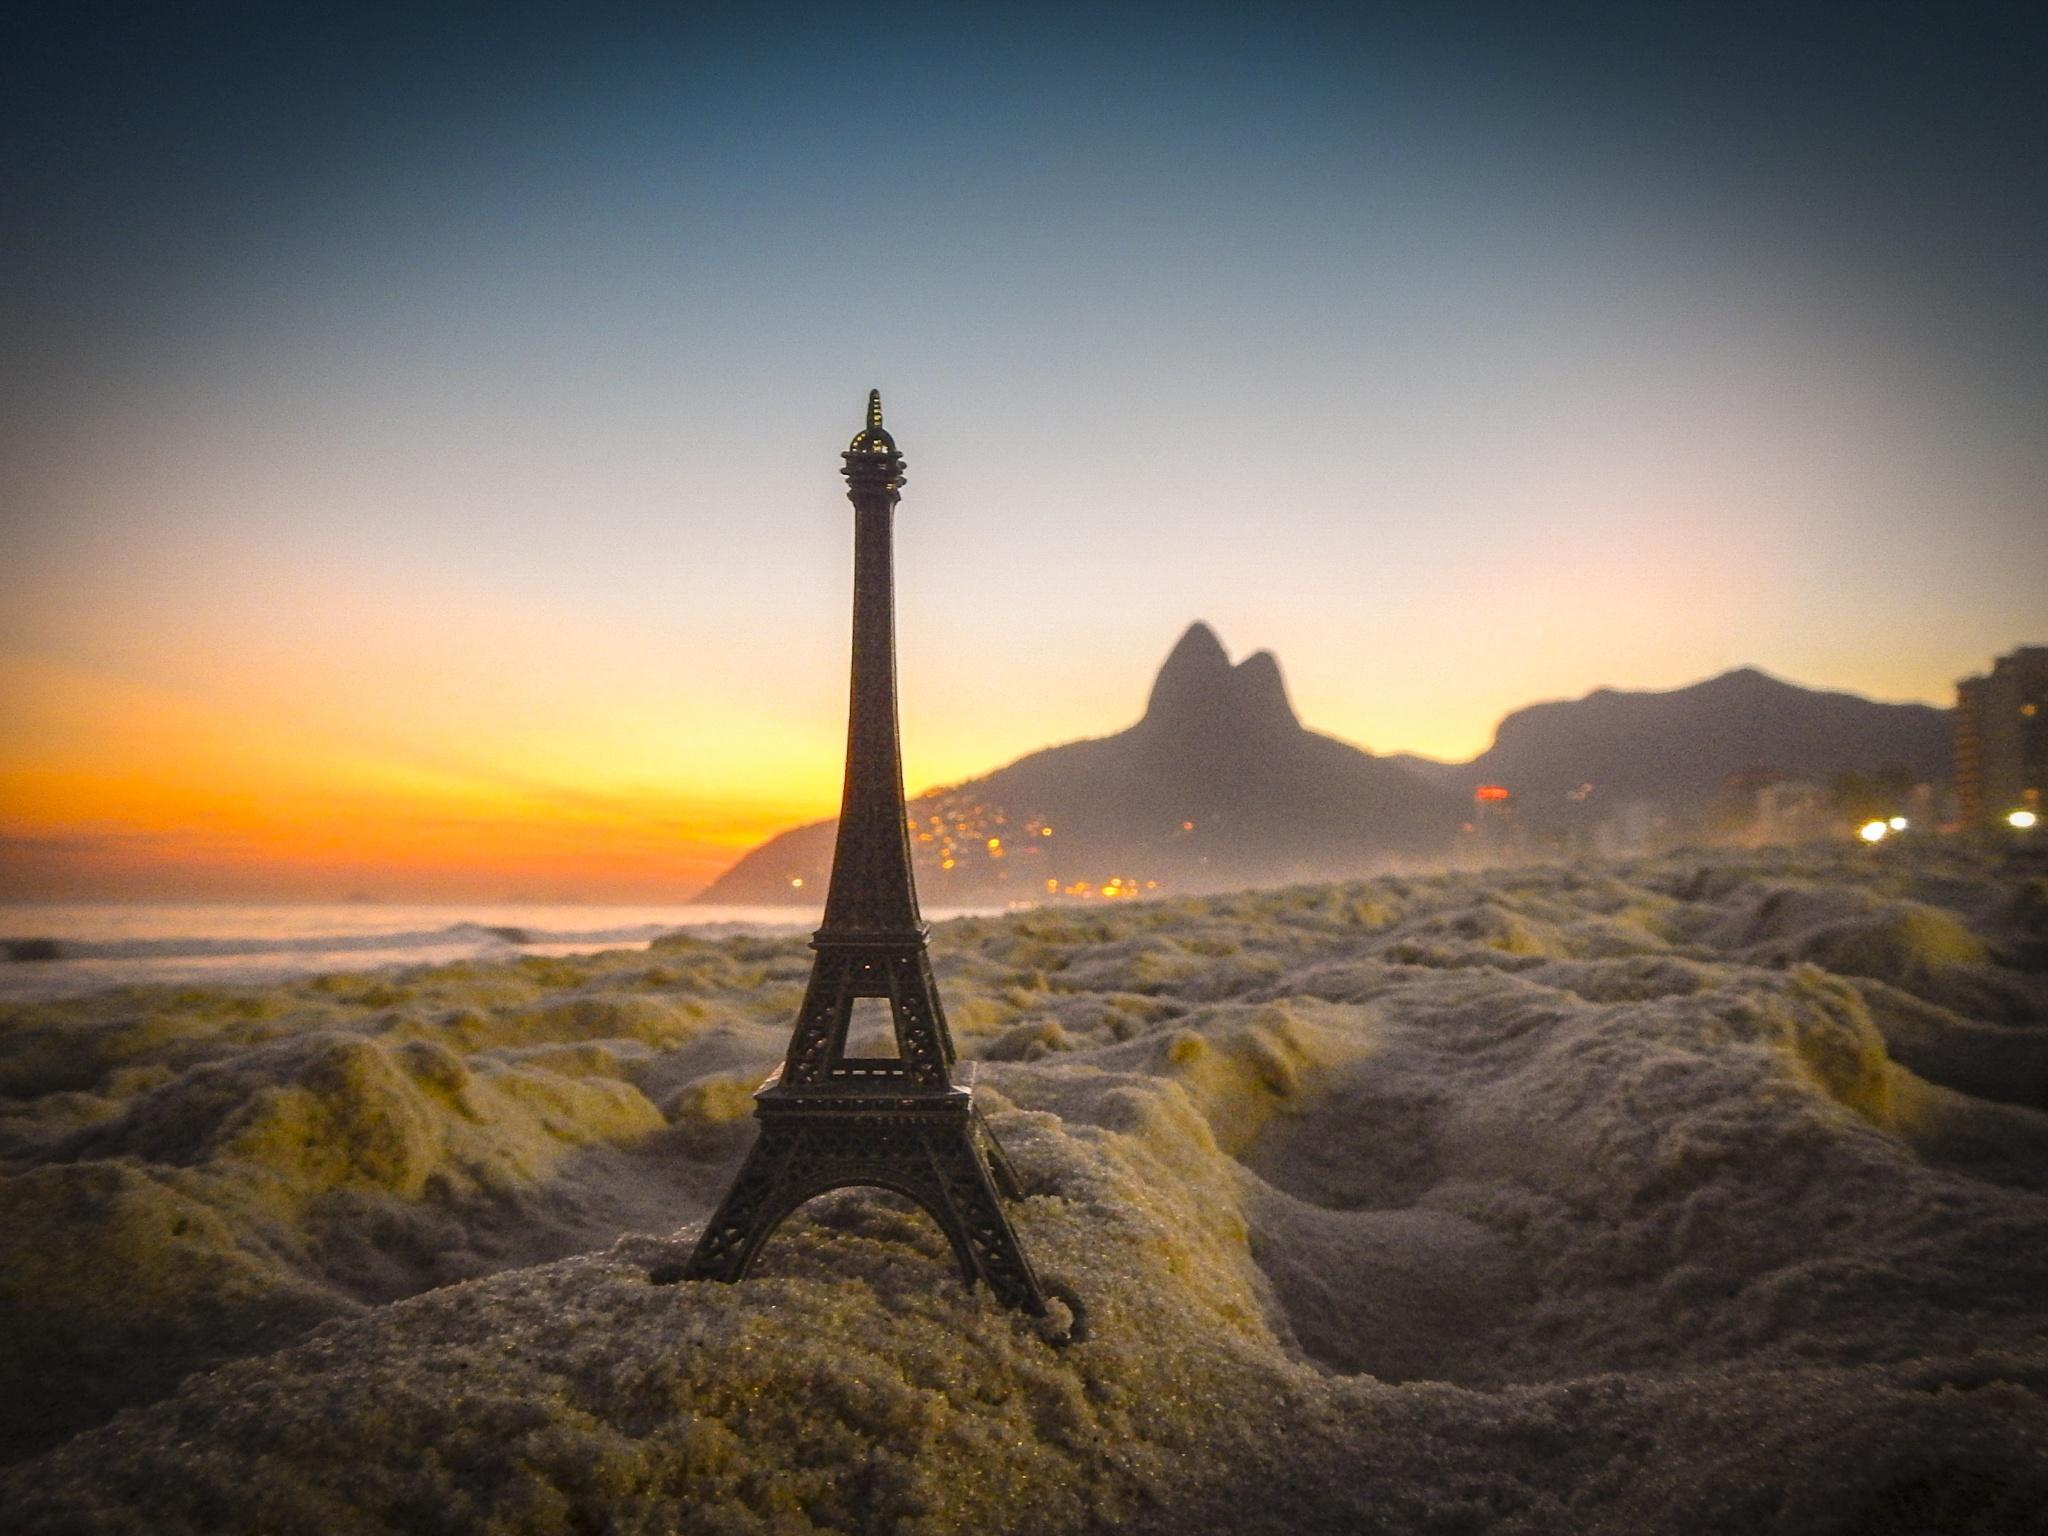 Pray for Paris by Marcelo Zal Riani